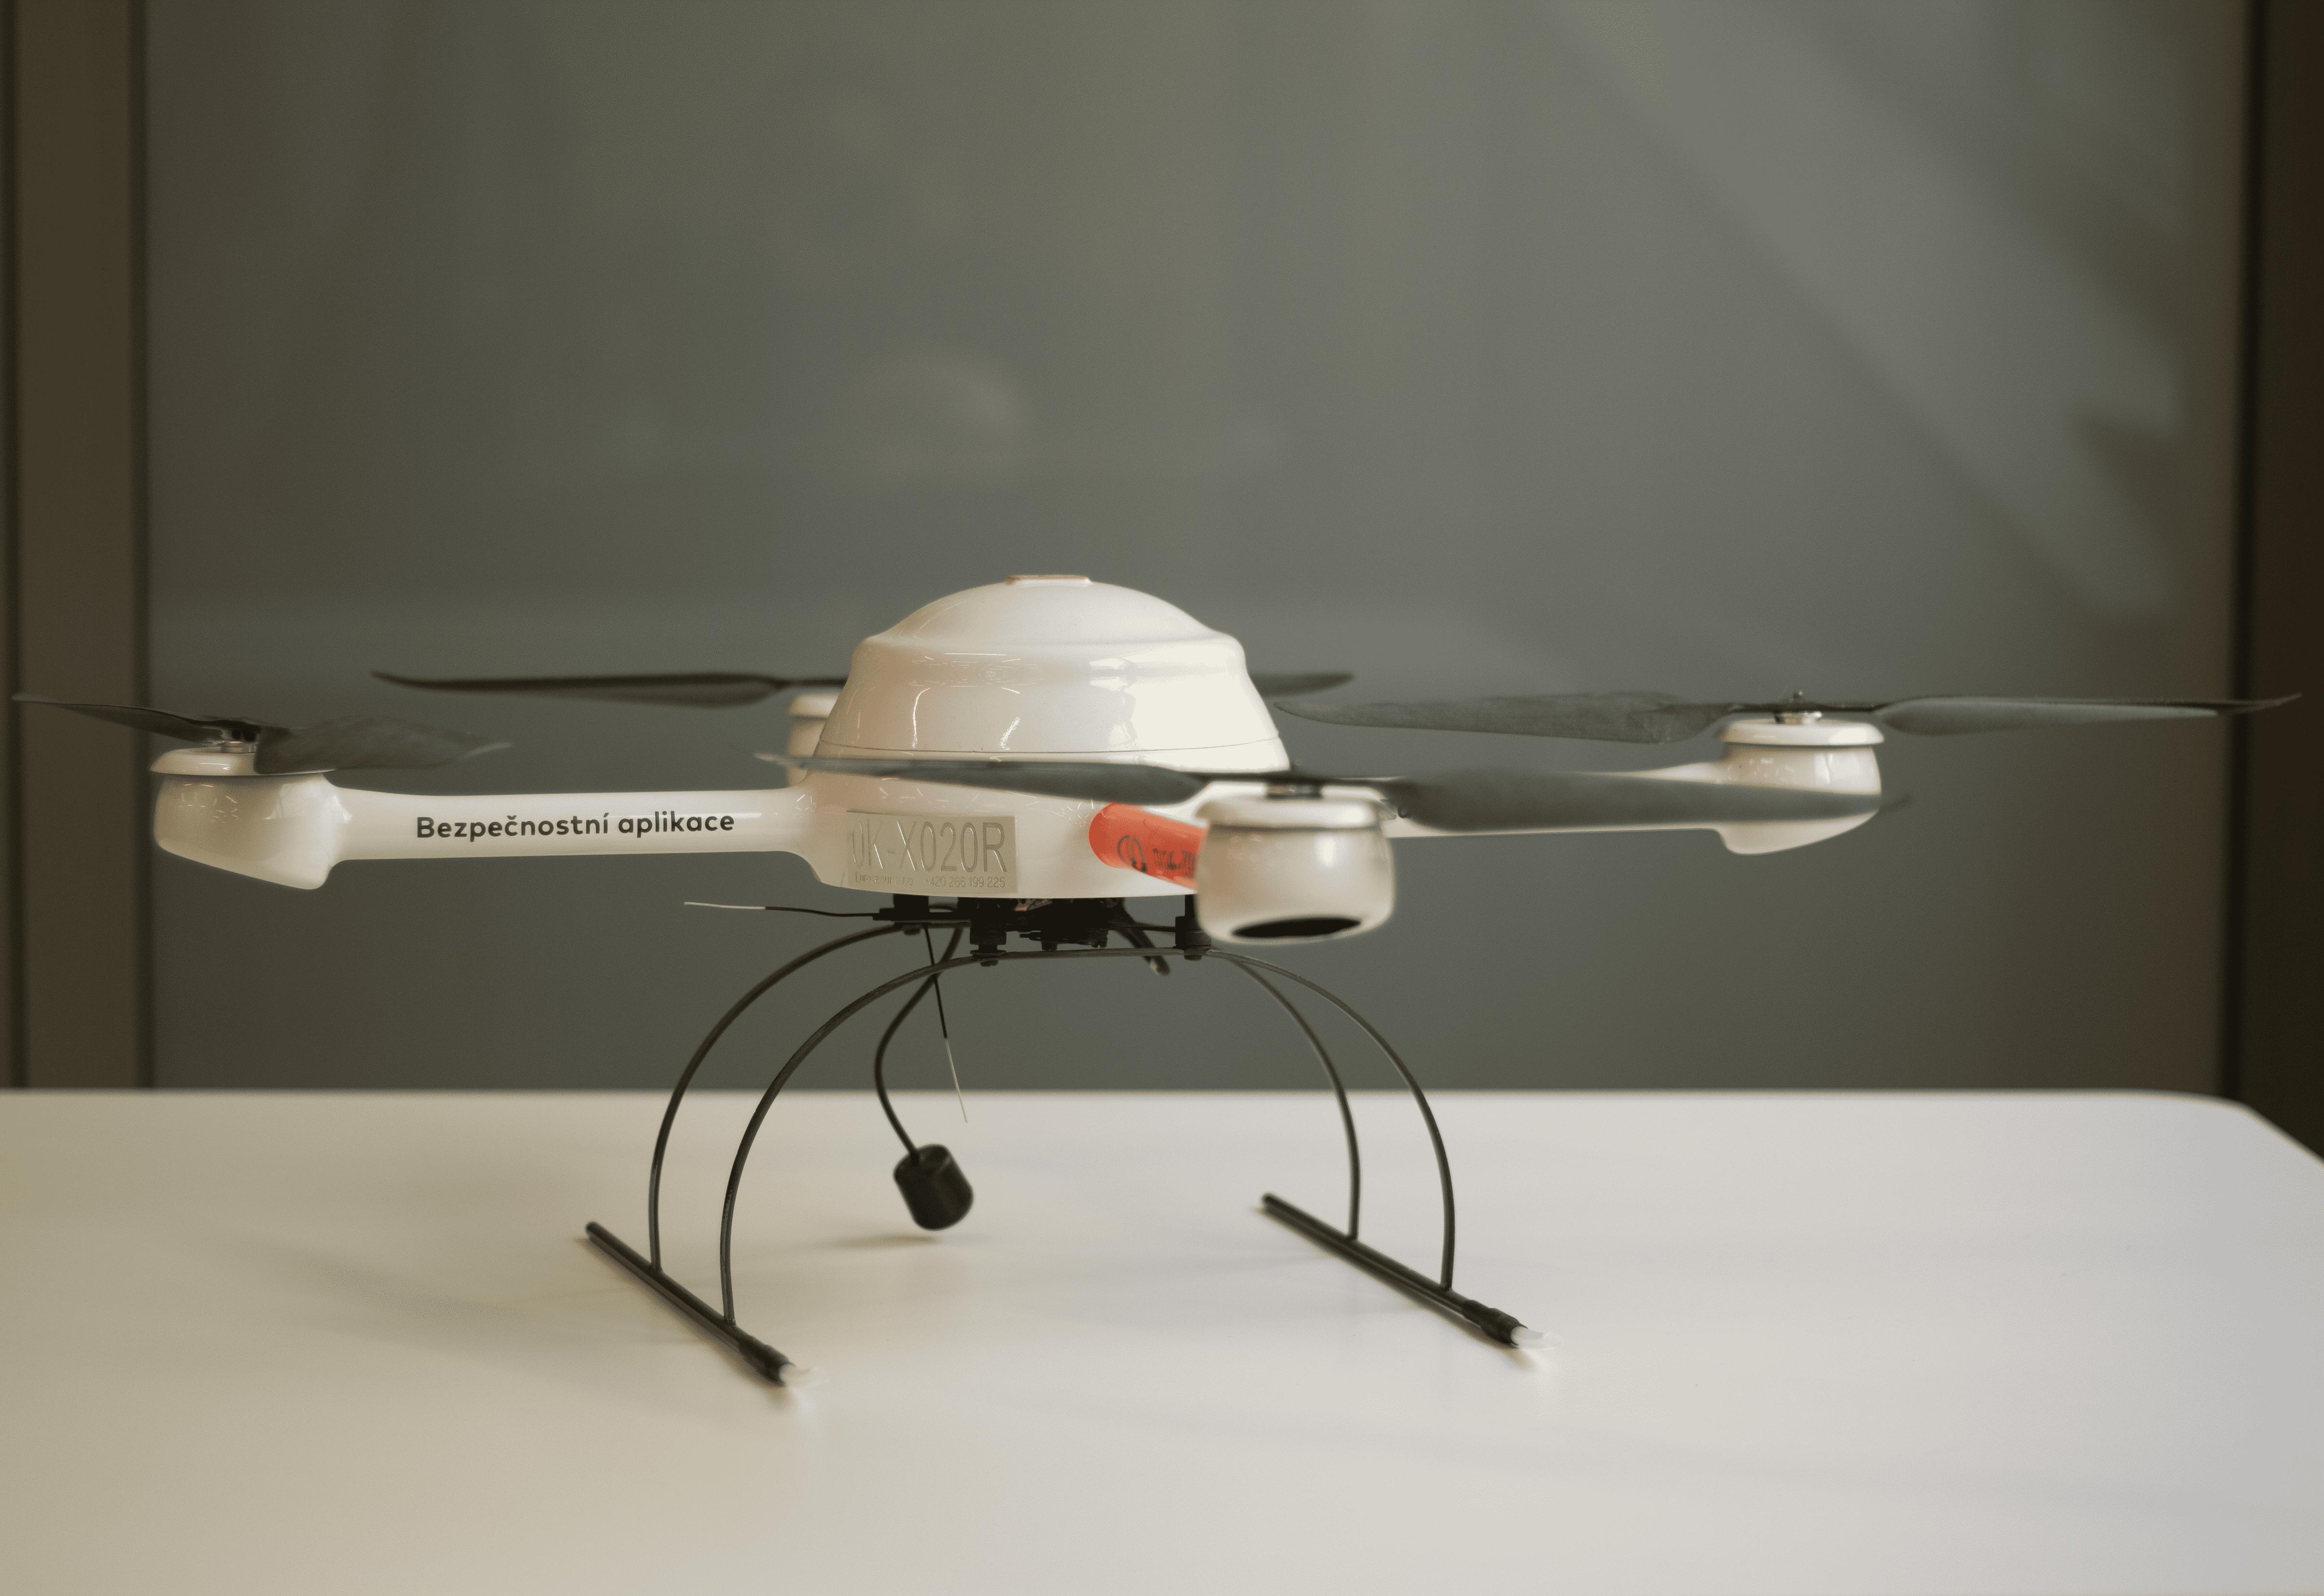 dron-mikedron_optimized